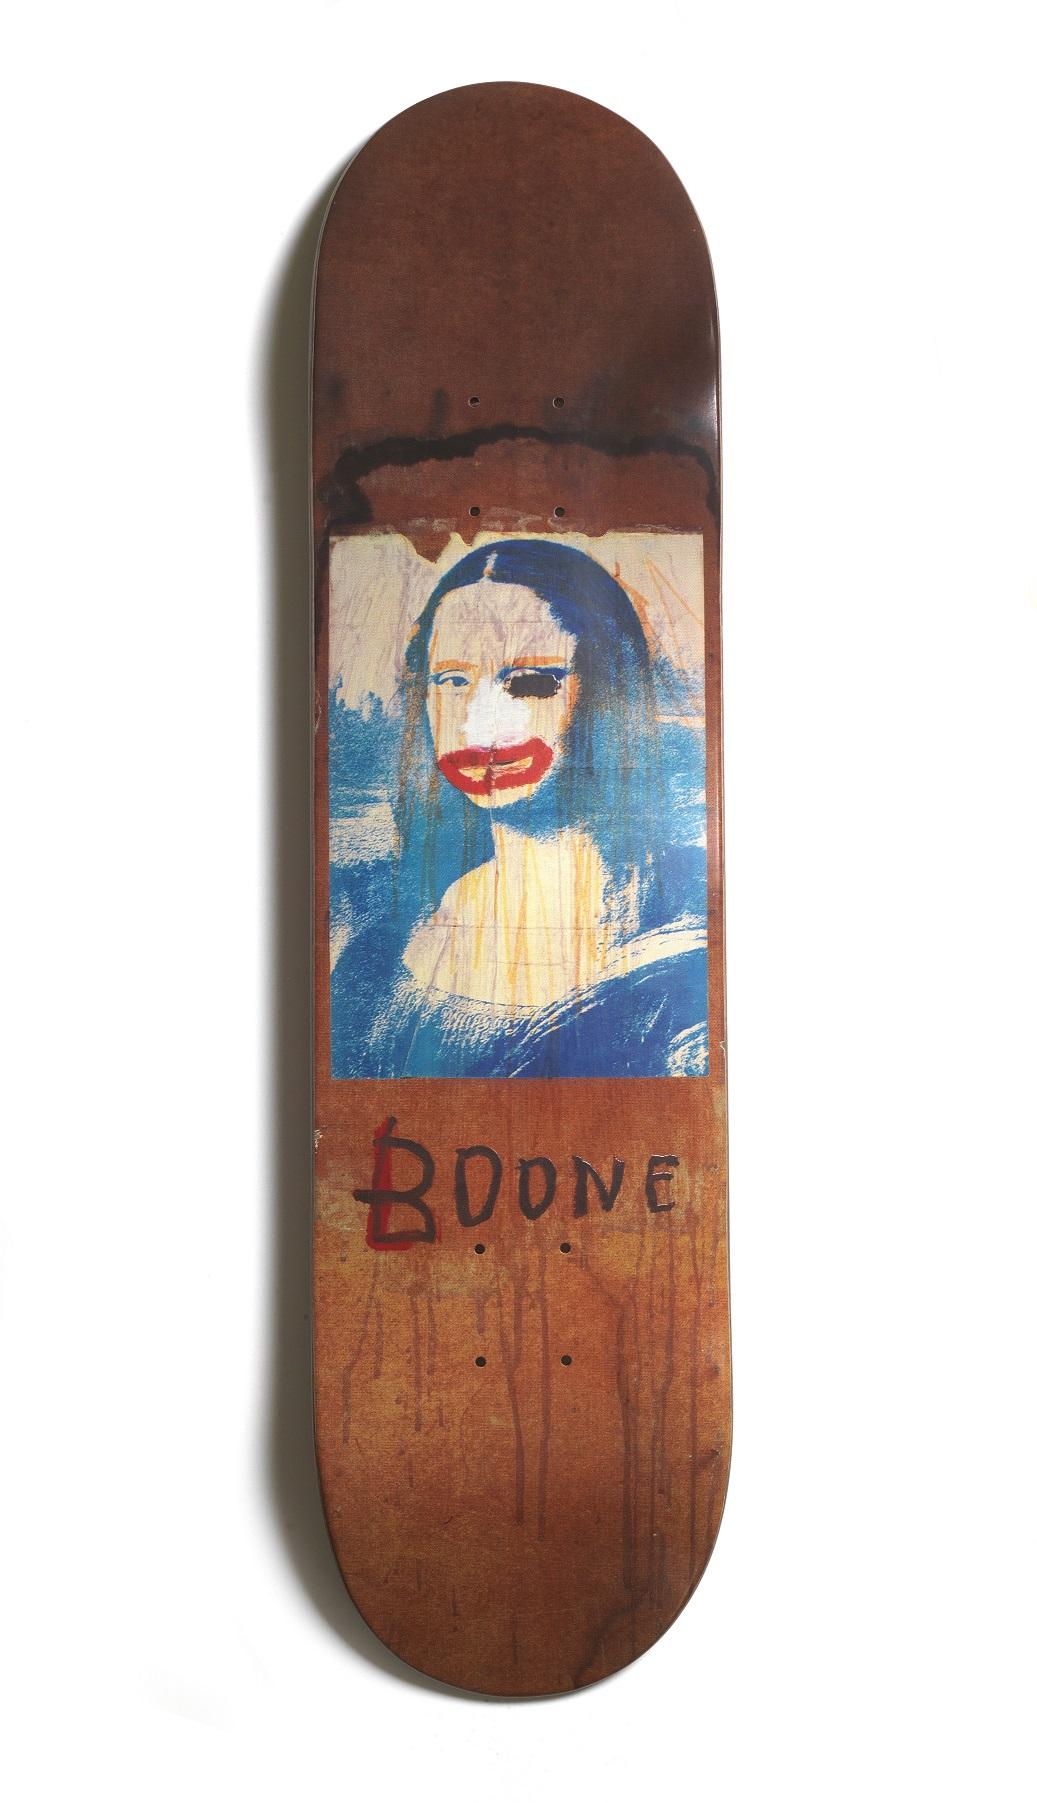 BASQUIAT - BOONE MONA LISA SKATEBOARD - £150 - IMAGE 2 - BROWNS FASHION.jpg